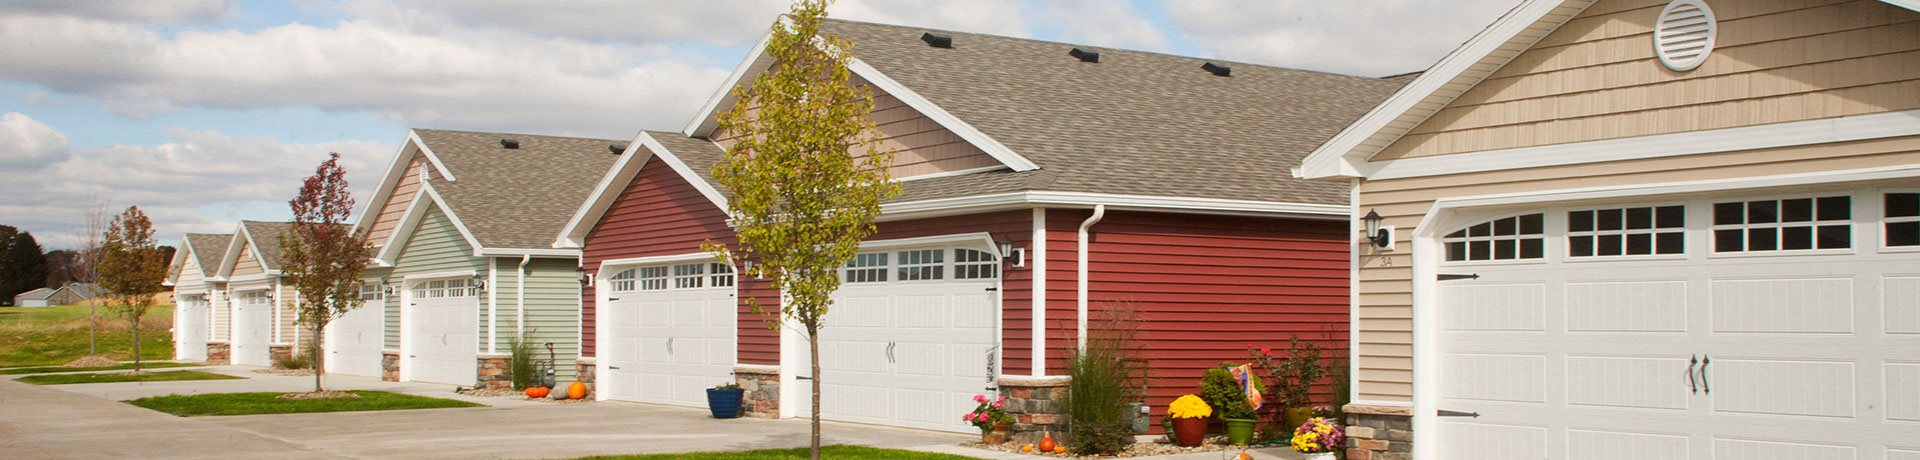 Apartments For Rent In Fort Wayne Indiana Redwood Fort Wayne Cowen